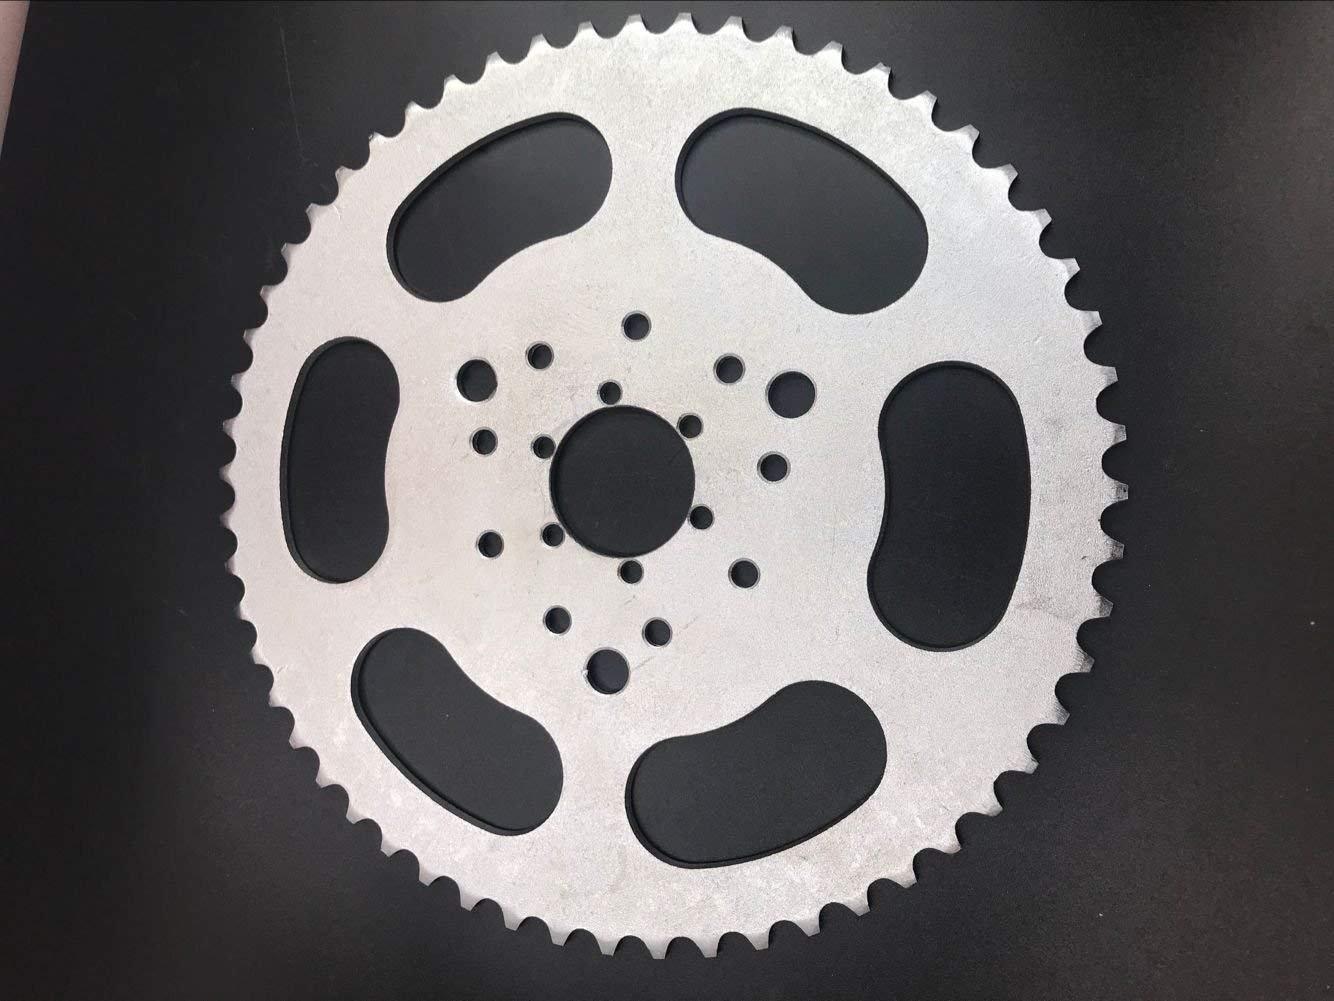 CDHPOWER Multifunctional 56 teeth sprocket -2 stroke gas engine motor gas motorized bicycle by CDHPOWER